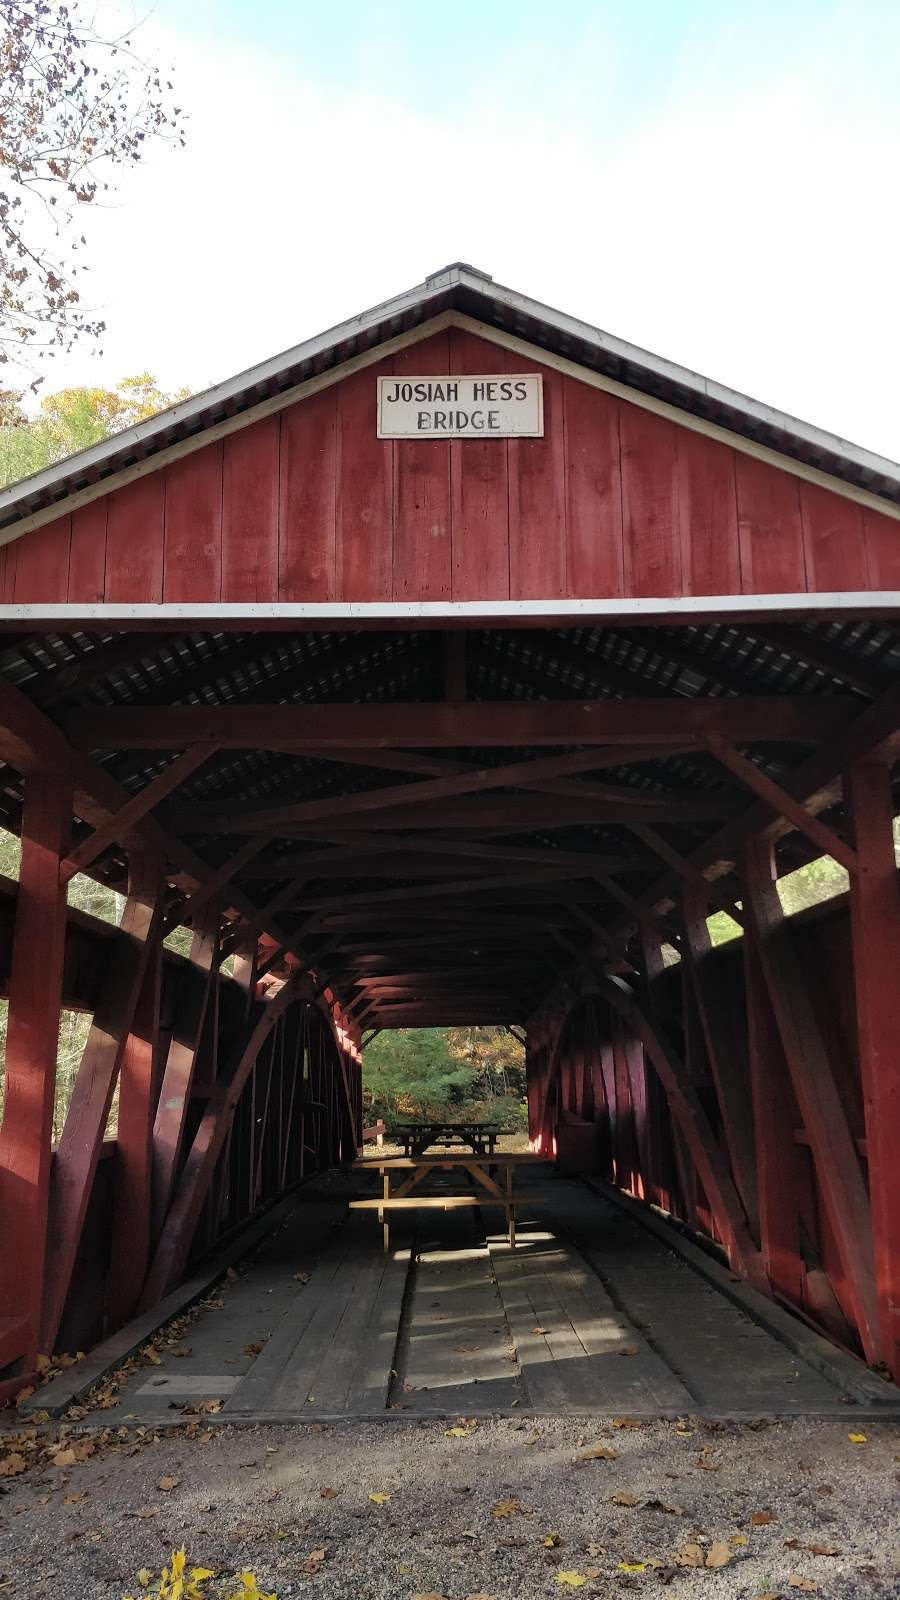 Josiah Hess Covered Bridge - museum  | Photo 8 of 10 | Address: Winding Rd, Orangeville, PA 17859, USA